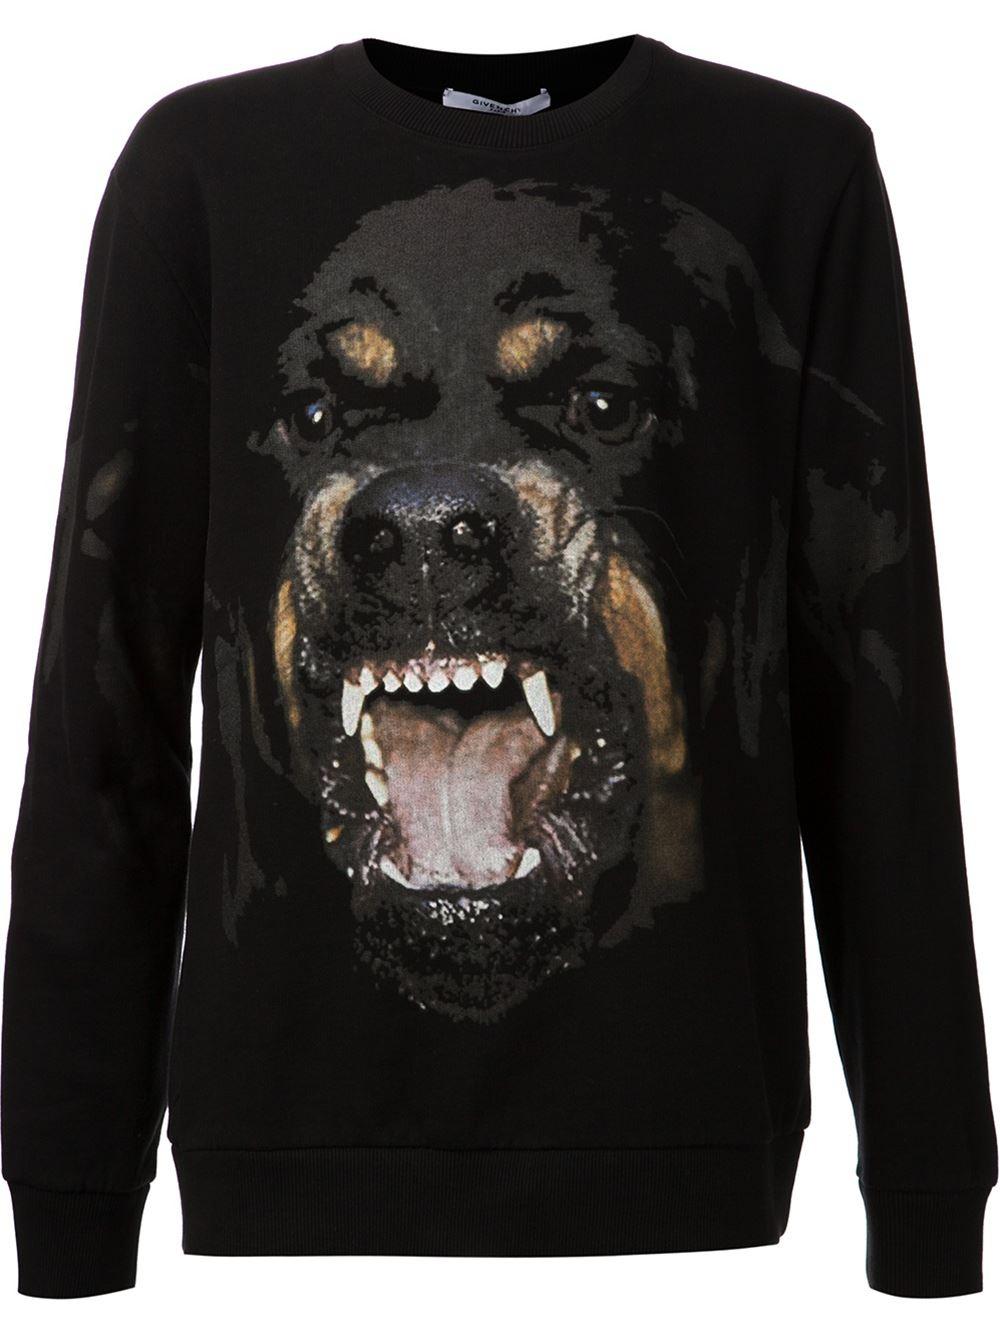 Givenchy Rottweiler Print Sweatshirt in Black for Men